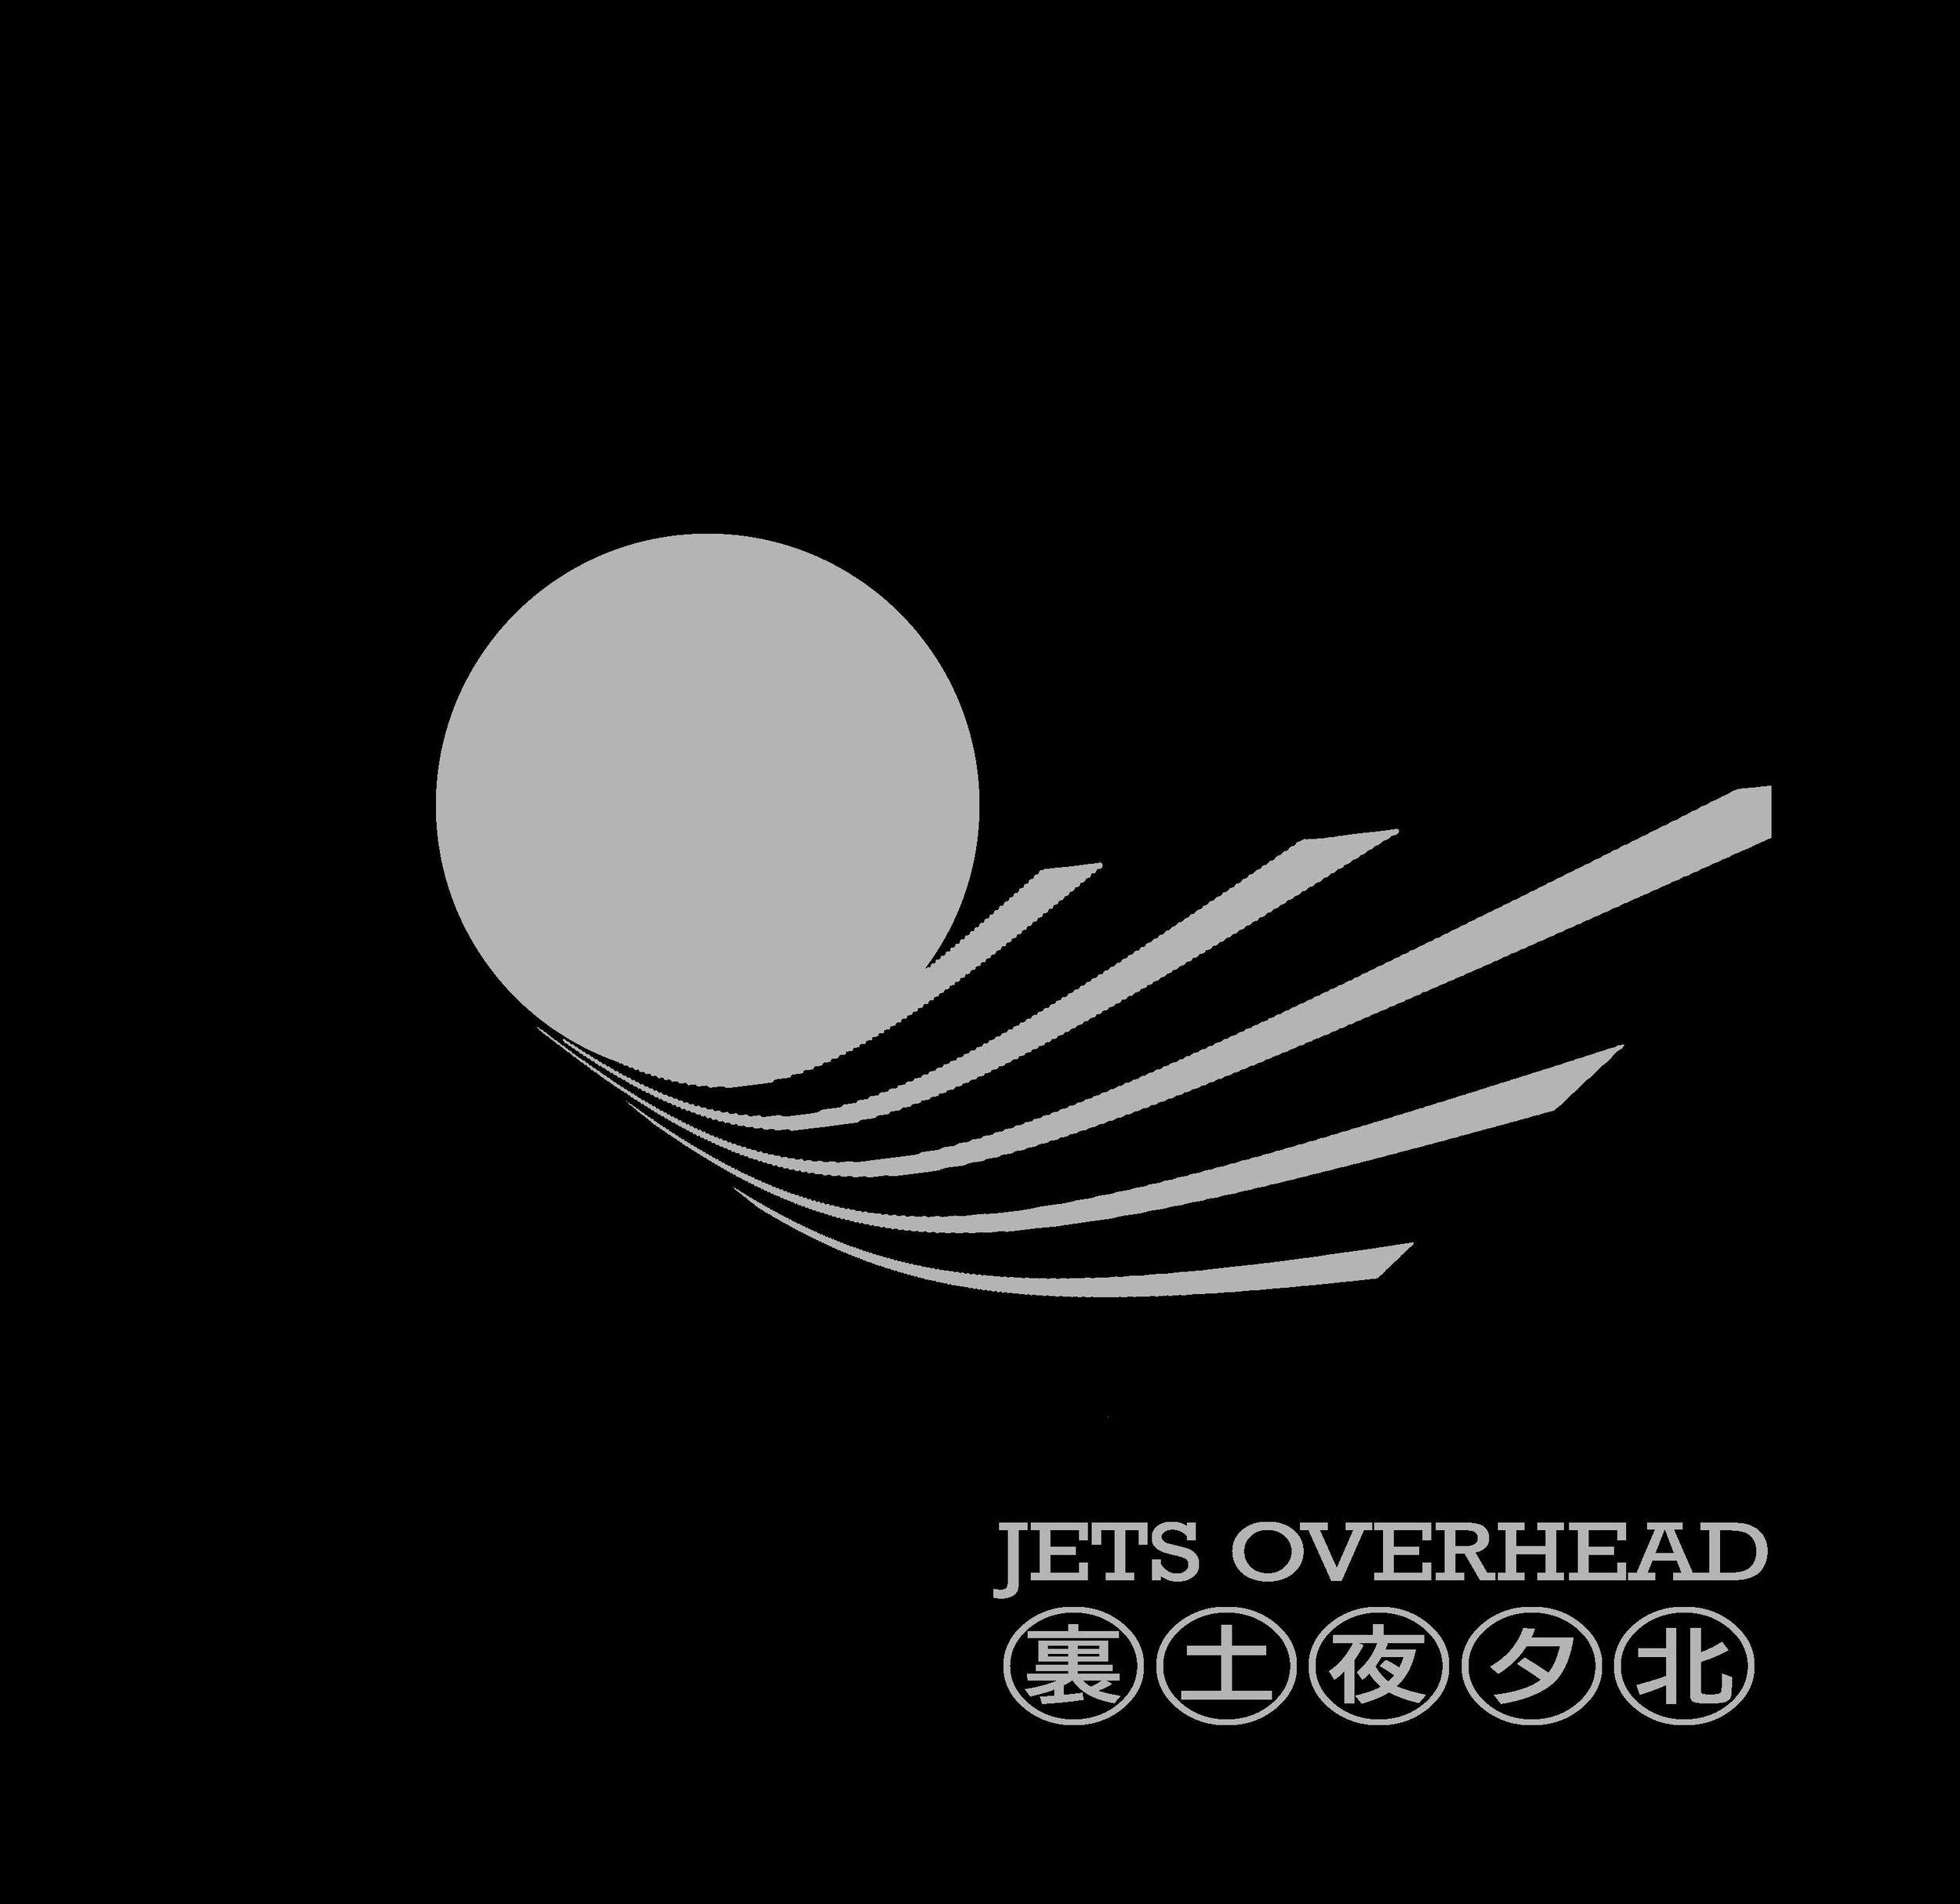 Jets Overhead EP - 2003Apple MusicSpotifyiTunesGoogle Play